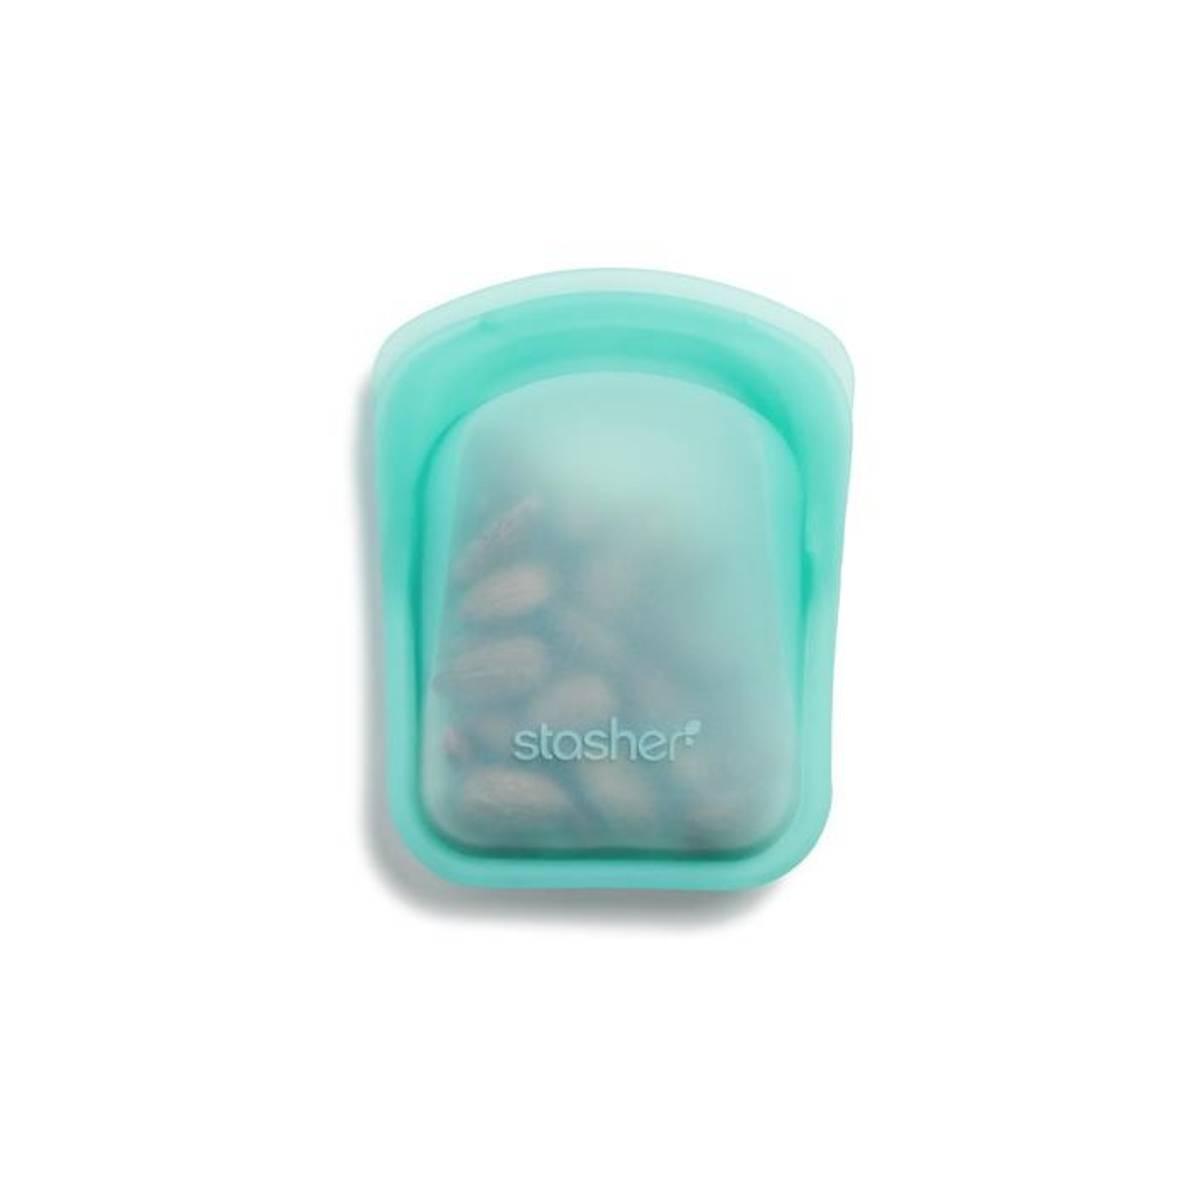 Stasher Pocket Size, Clear & Aqua / Stasher Bags